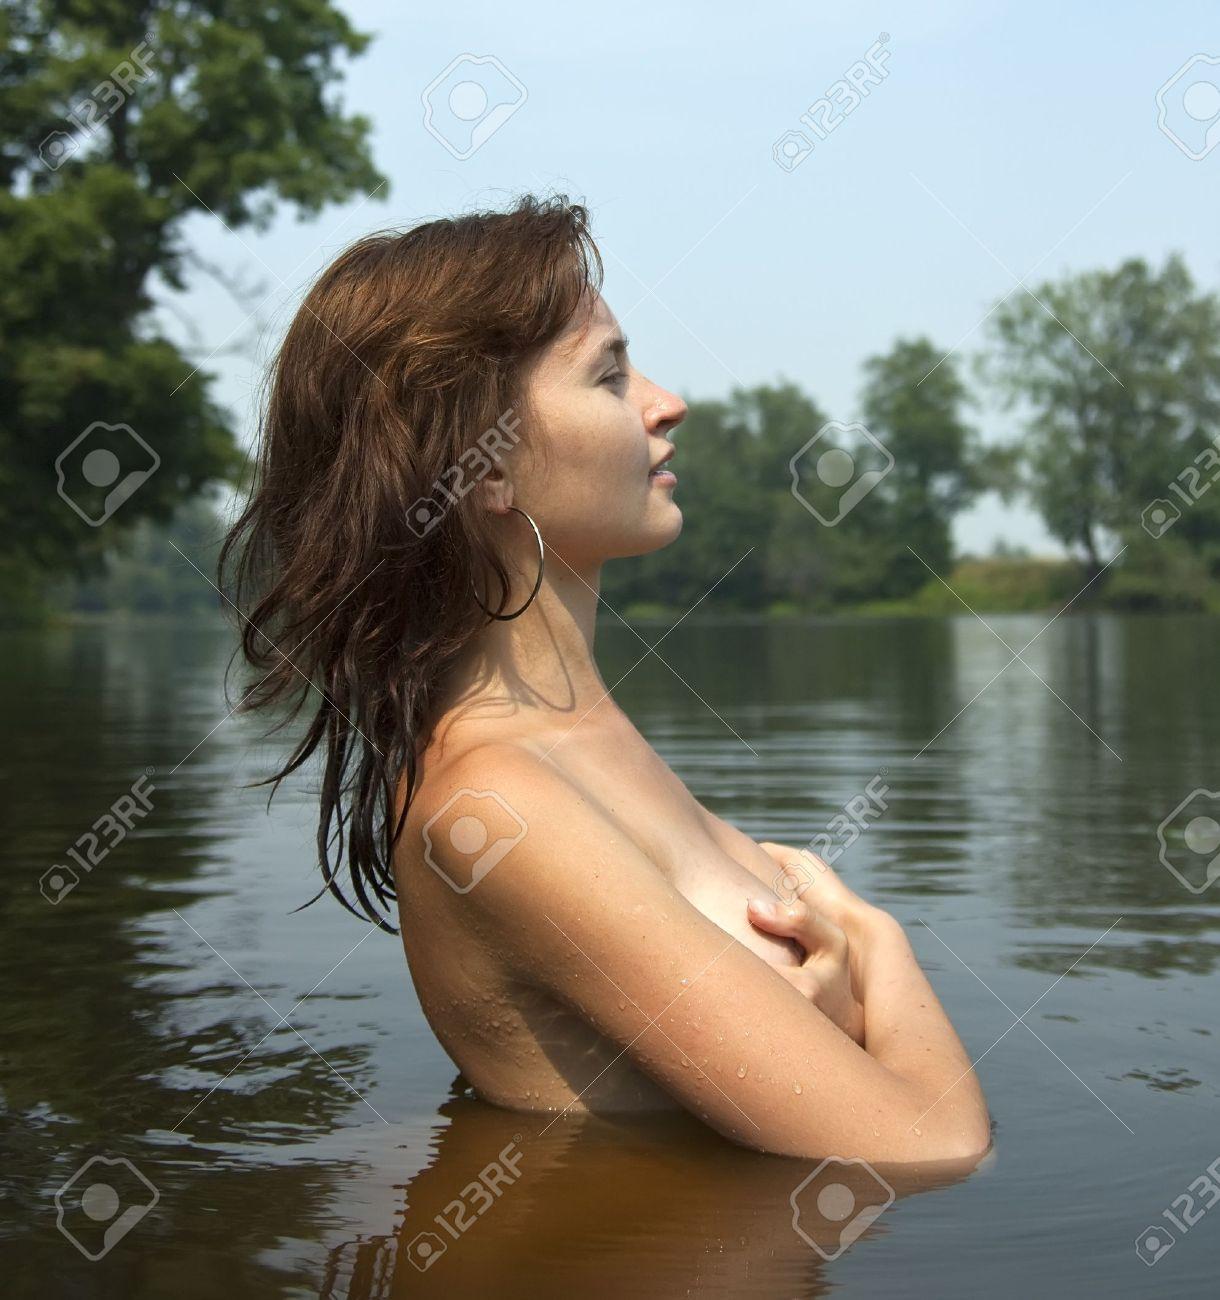 sexy-woman-swimming-nude